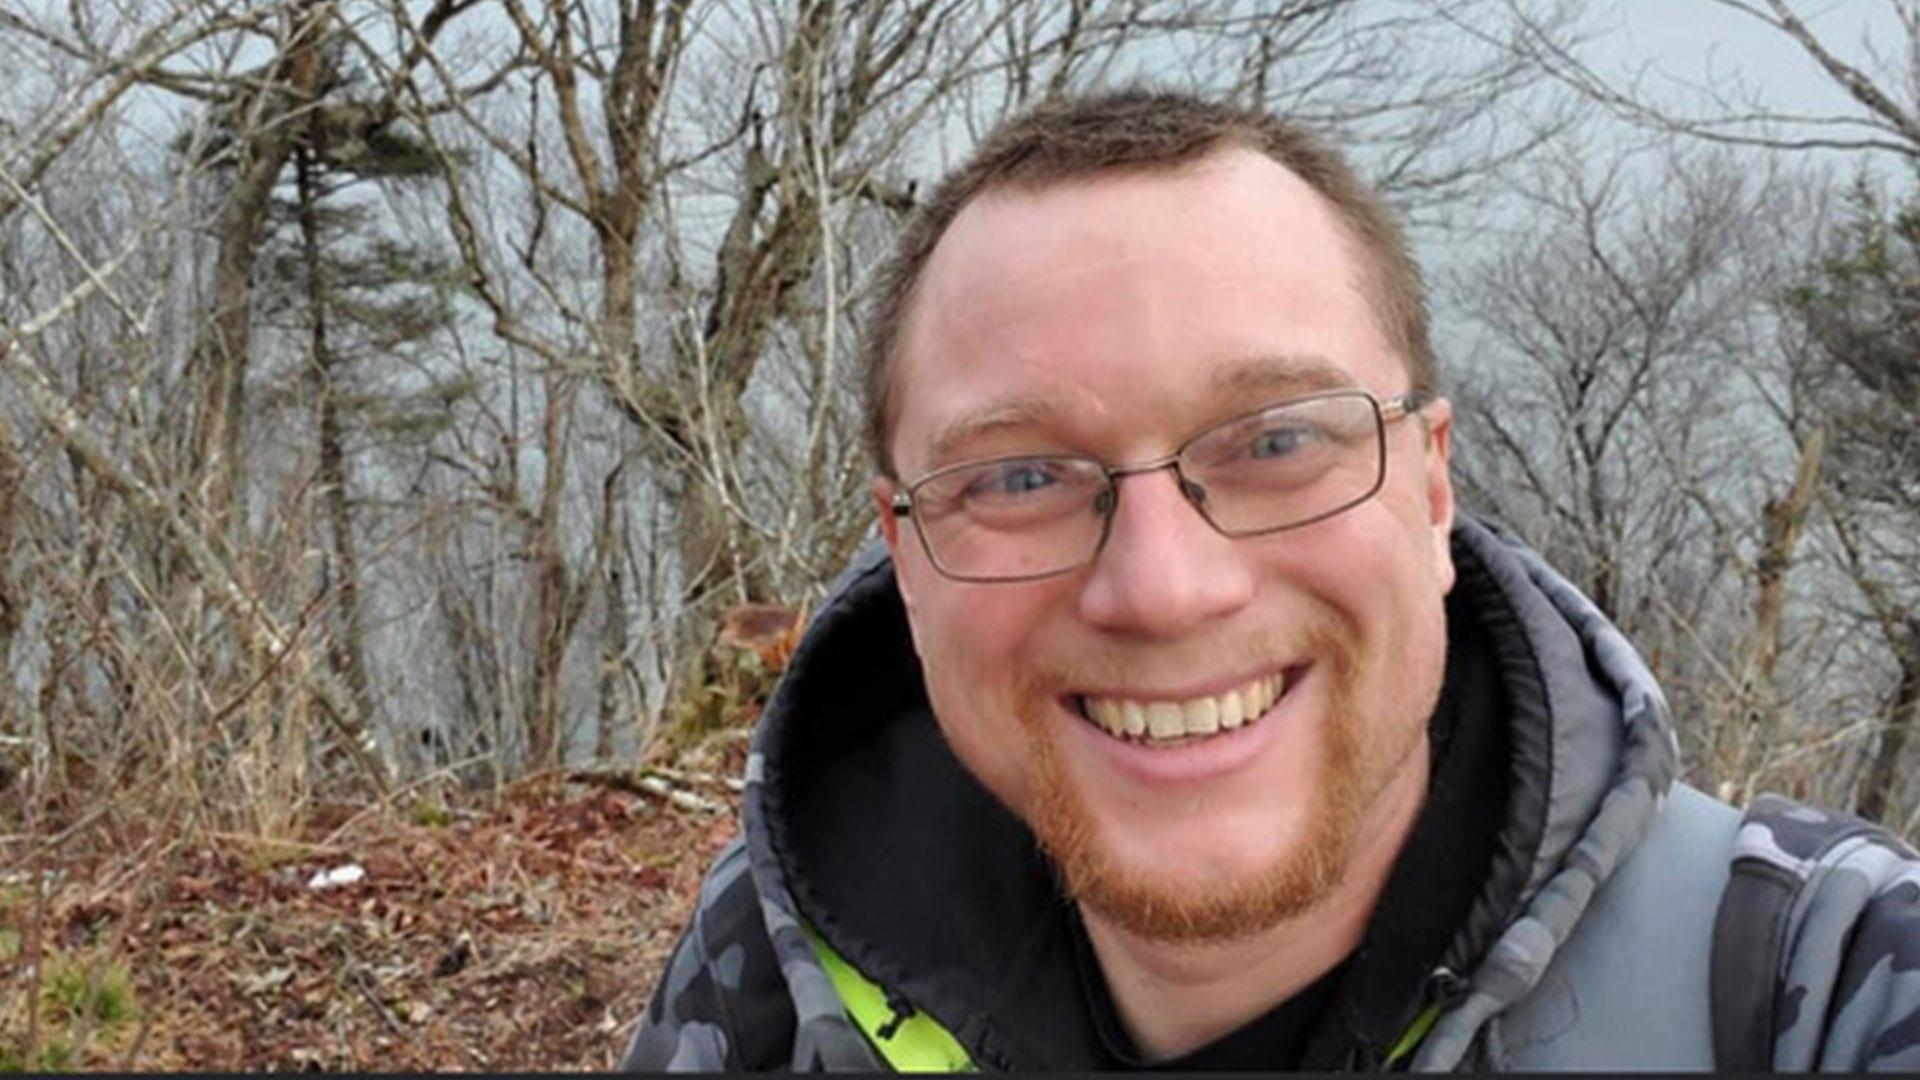 Human trafficking investigation in Alberta leads to arrest of Mi'kmaw man in Nova Scotia